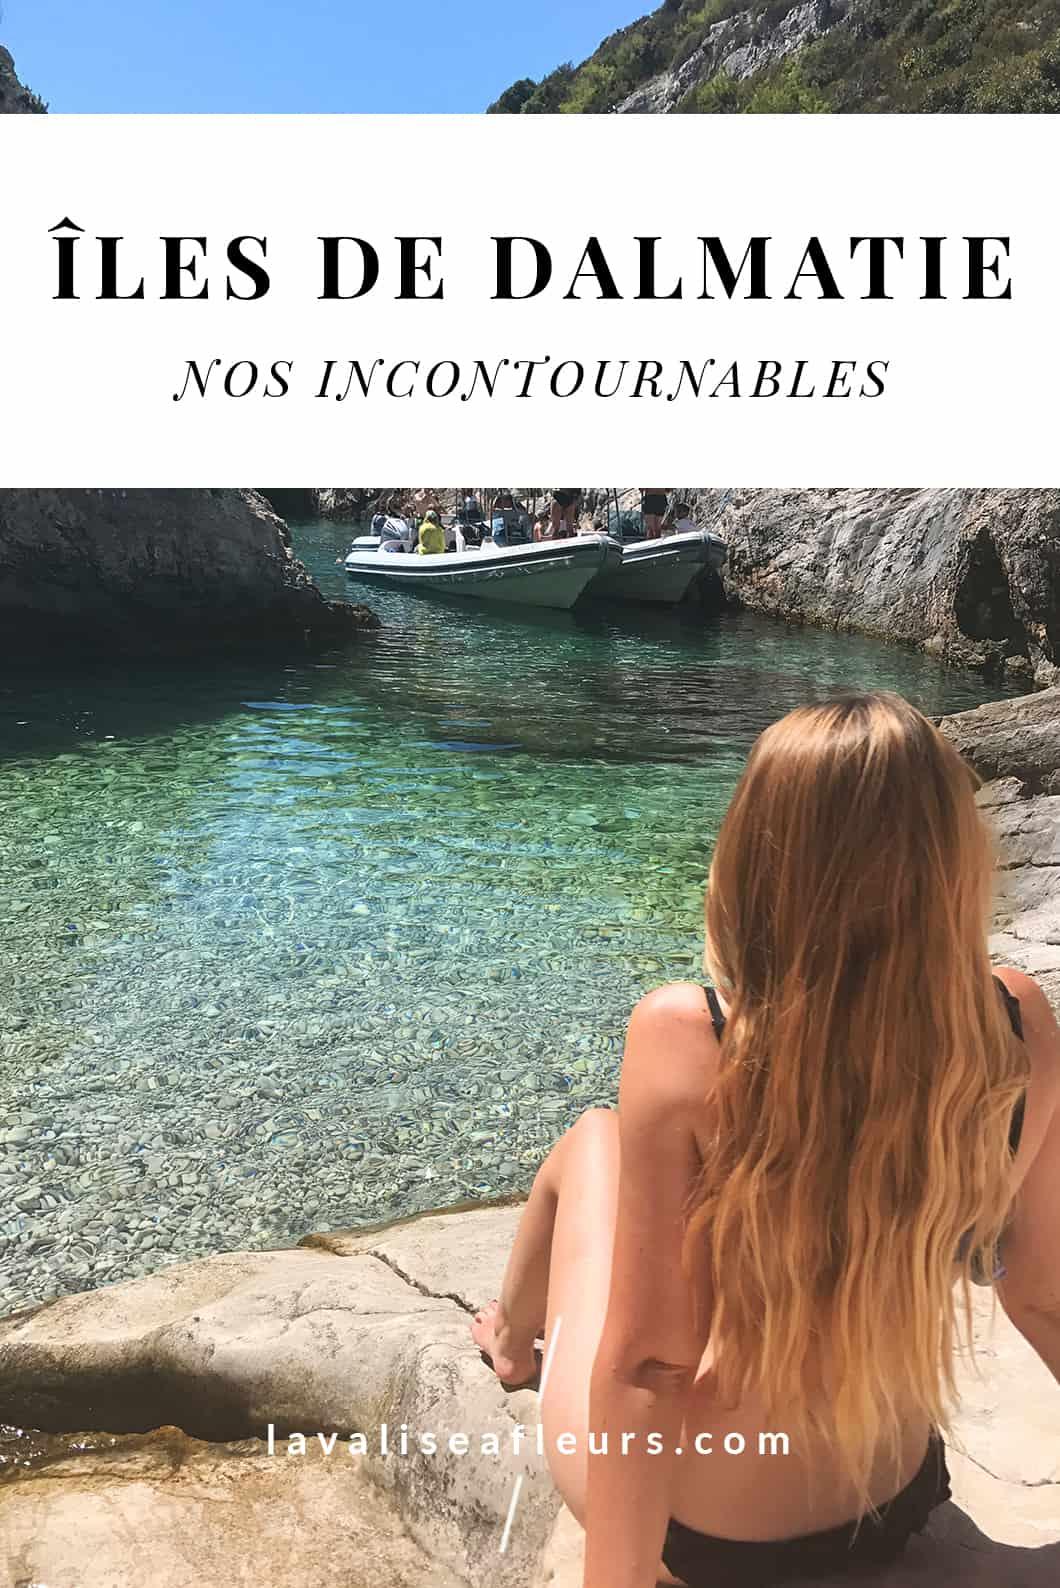 Îles de Dalmatie, nos incontournables